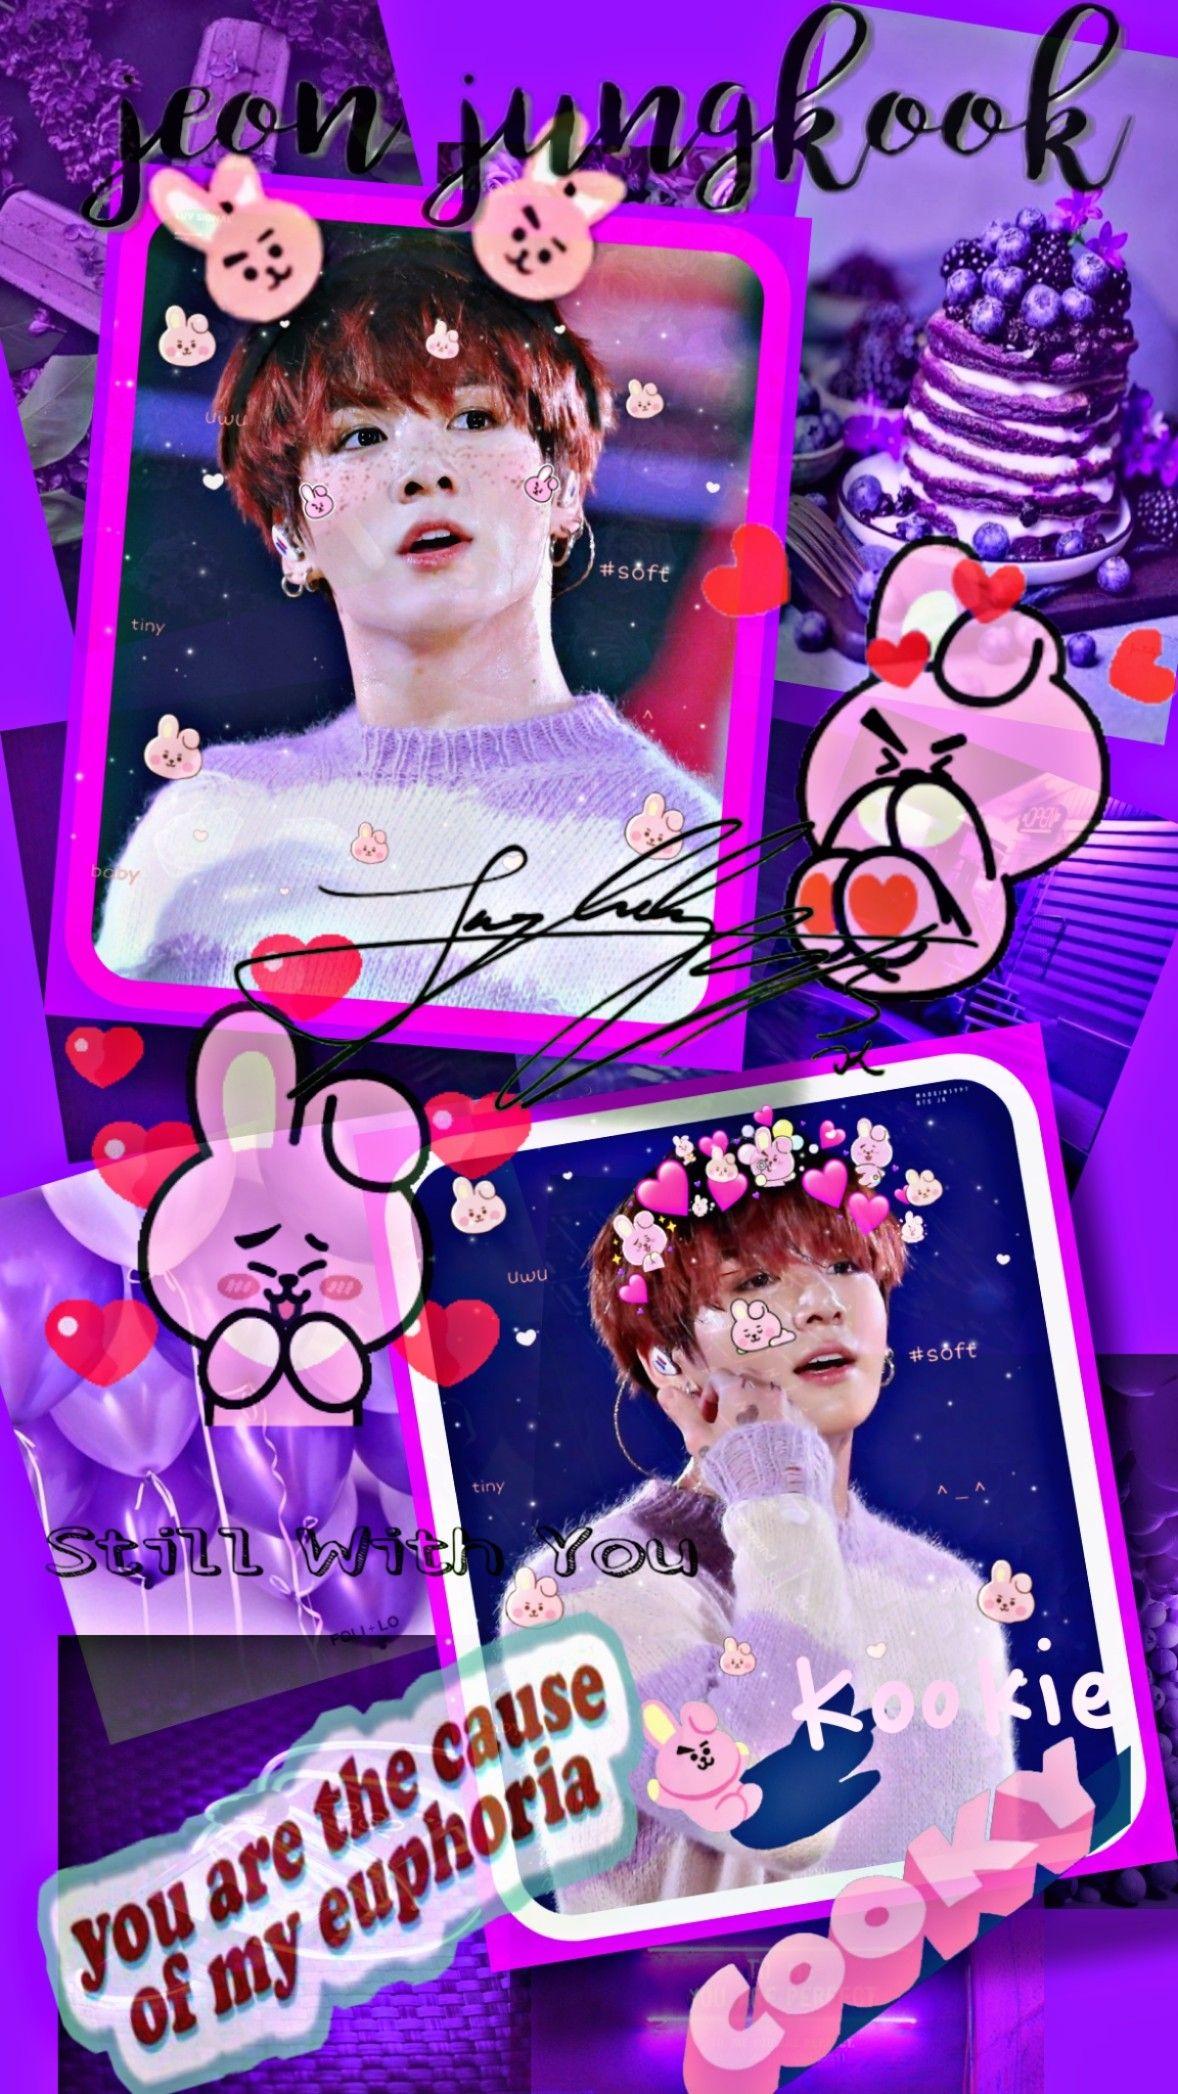 Jungkook Bts Wallpaper Di 2021 Foto Lucu Lucu Bts wallpaper 2021 purple